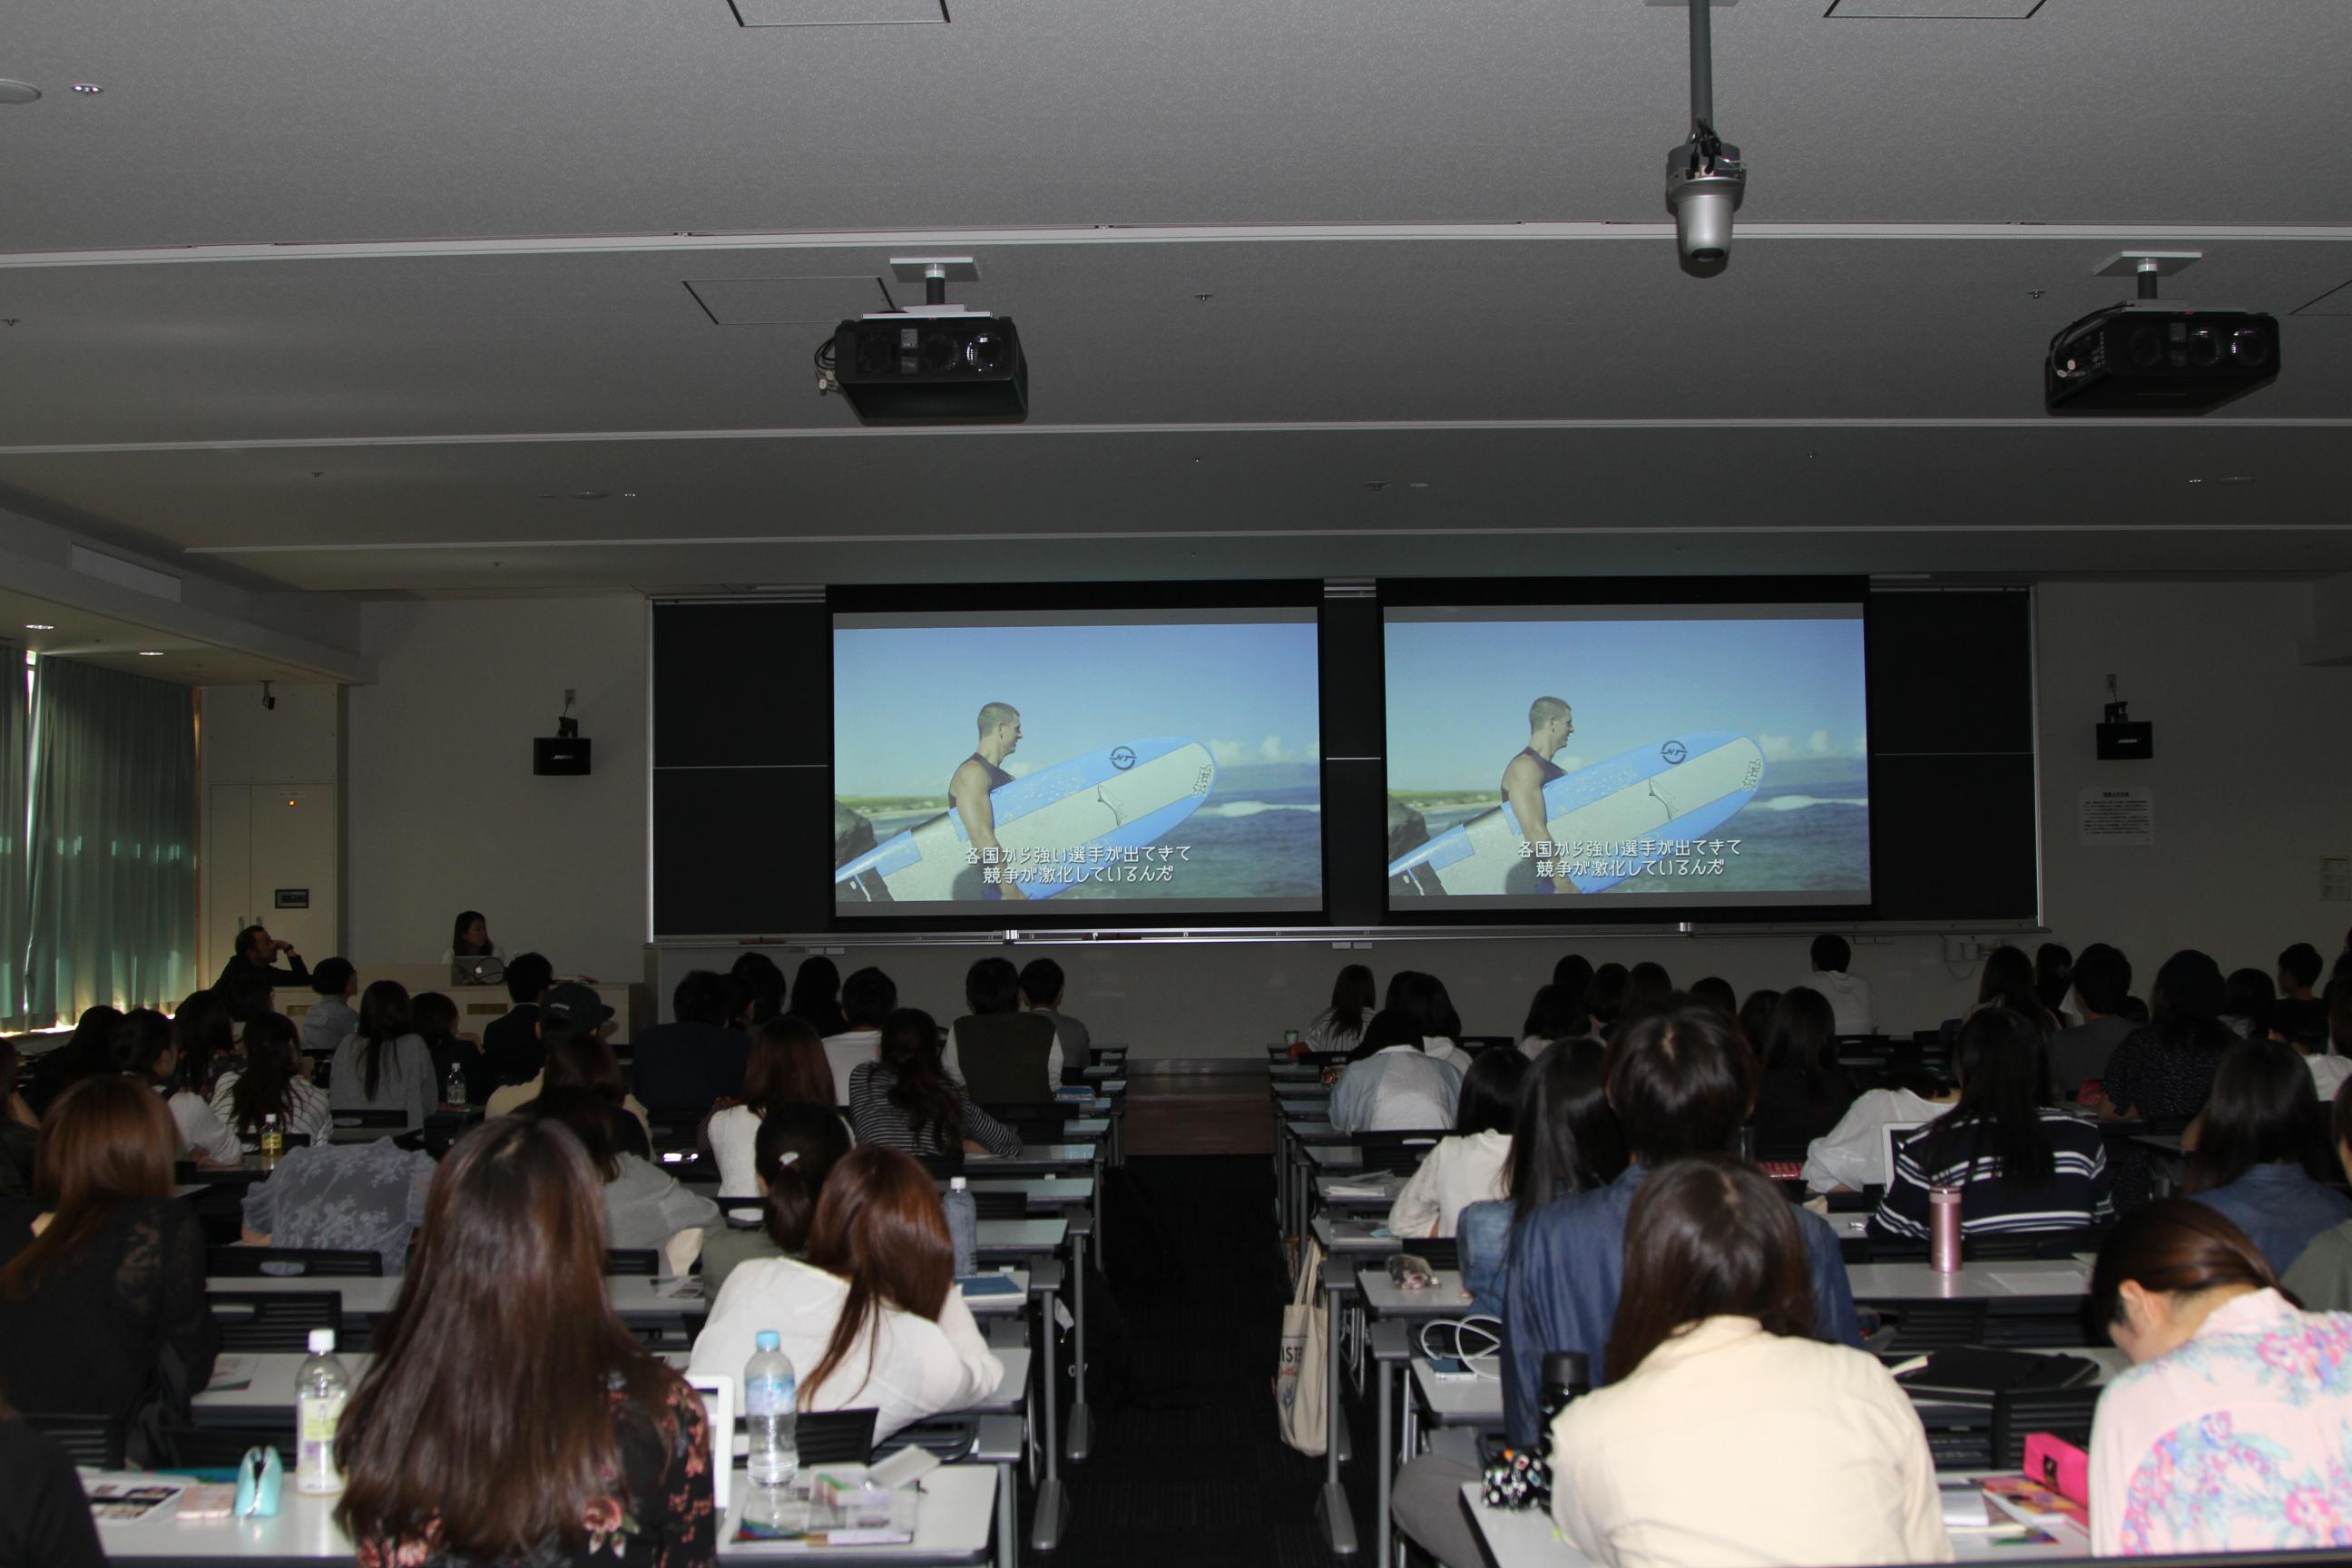 TEAM BEYOND×WOWOW 「PARA-SPORTS ACADEMY」青山学院大学で実施